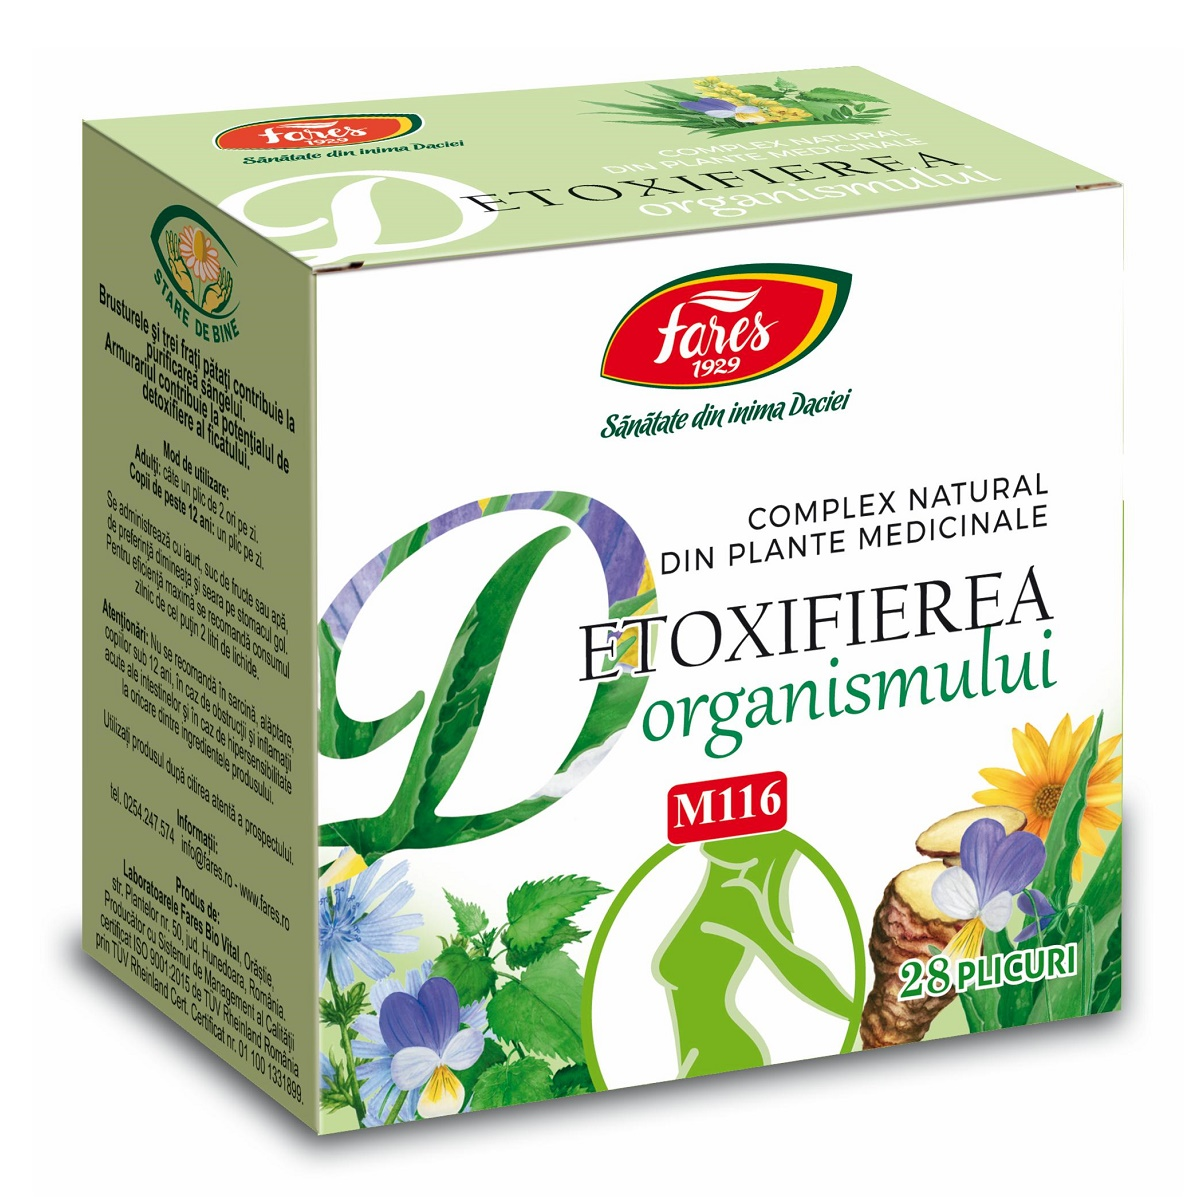 Detoxifierea organismului M116, 28 plicuri, Fares drmax.ro